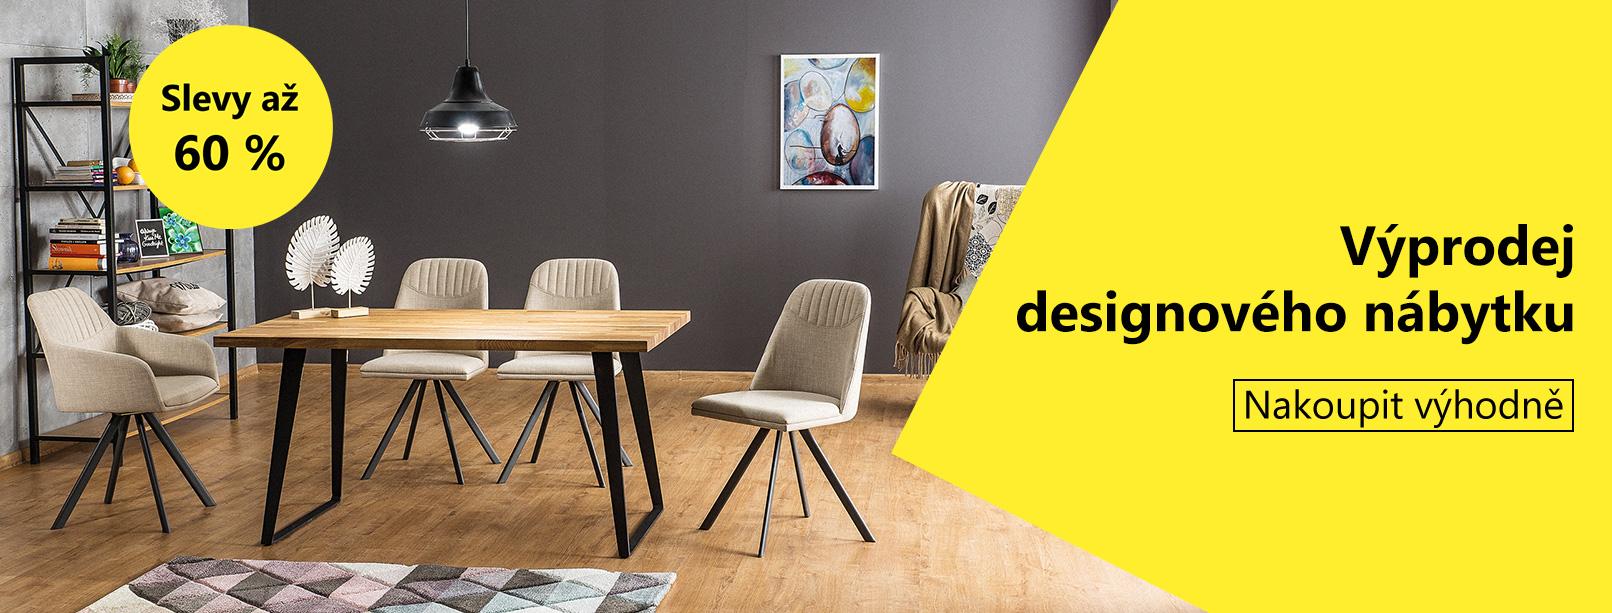 Slevy až 60 % - Výprodej designového nábytku